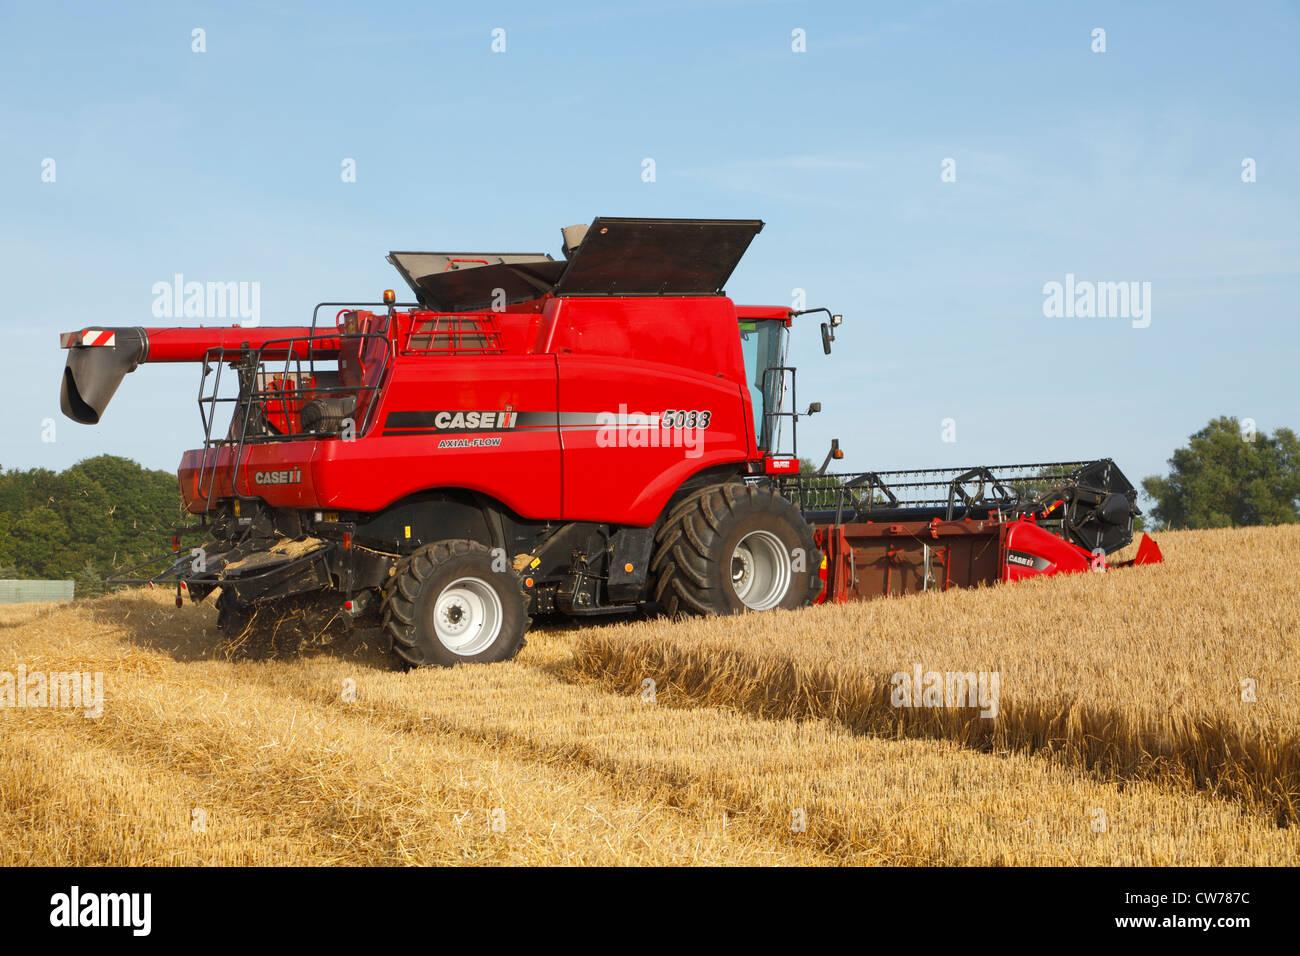 International Harvester 5088 : Red case ih axial flow combine harvester harvesting